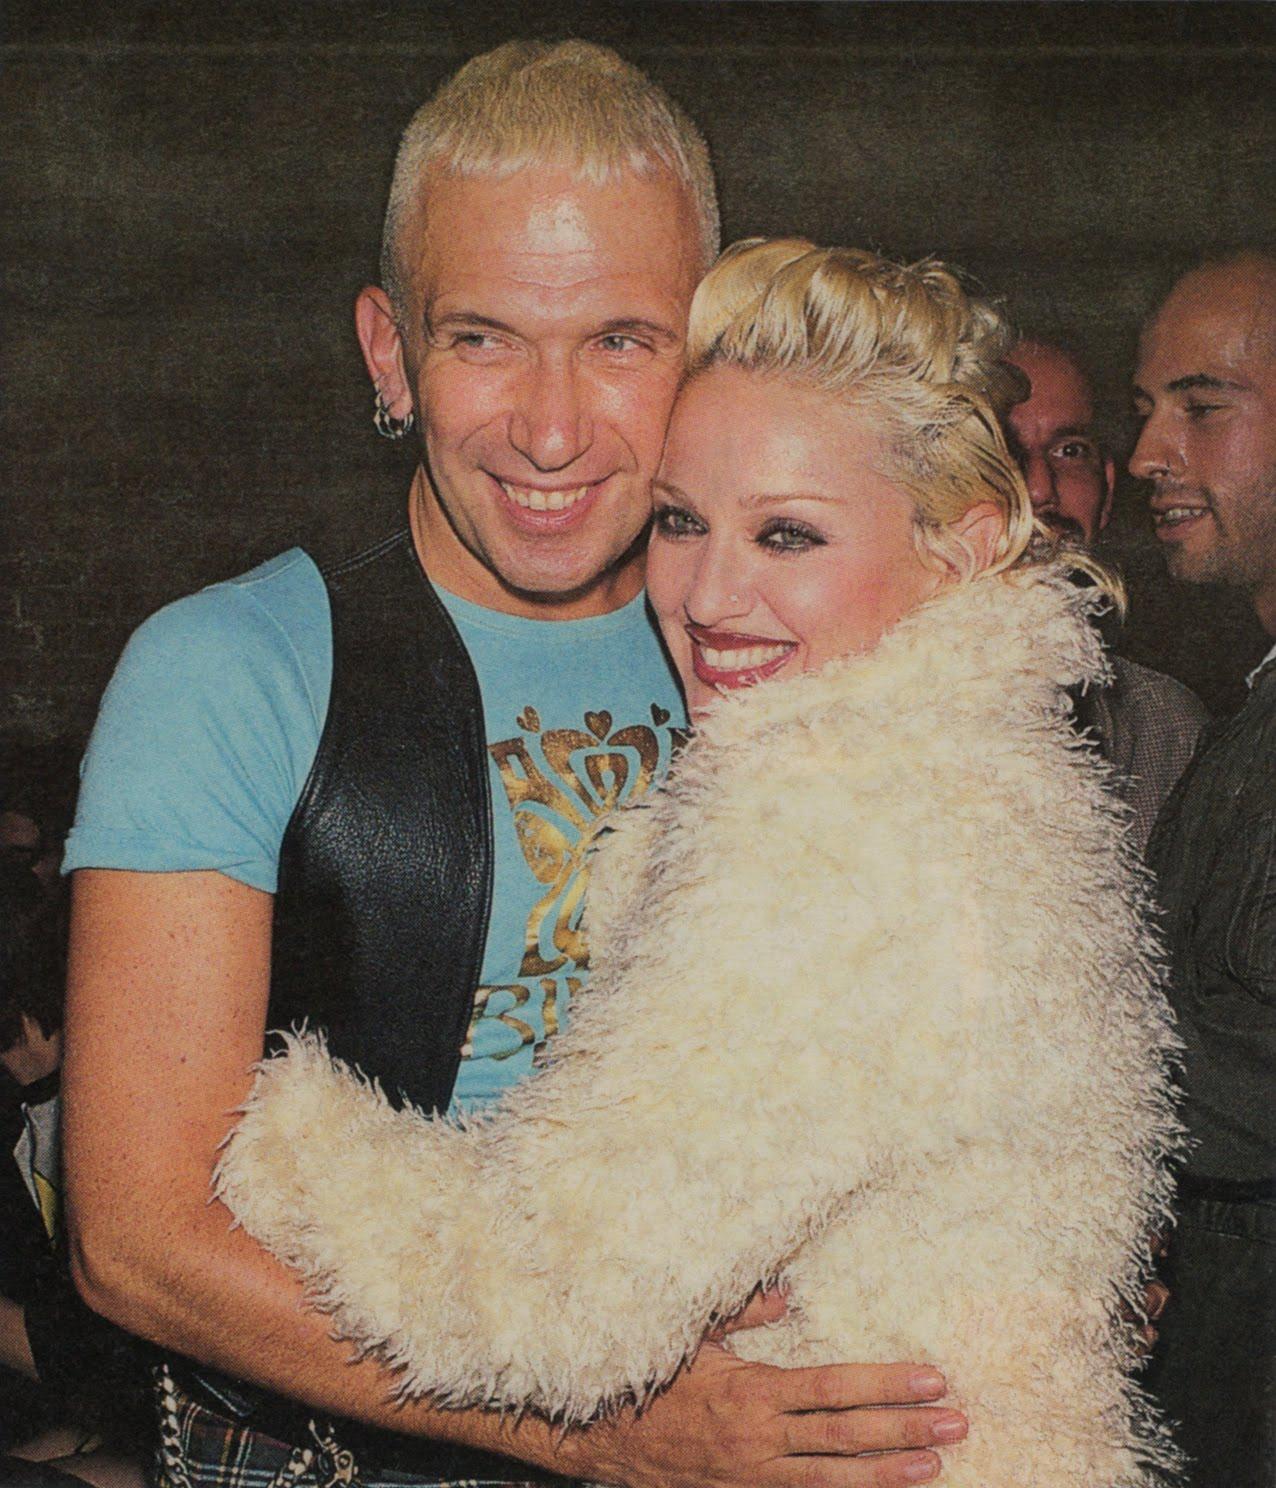 Pud Whacker's Madonna Scrapbook: Jean Paul Gaultier and Madonna